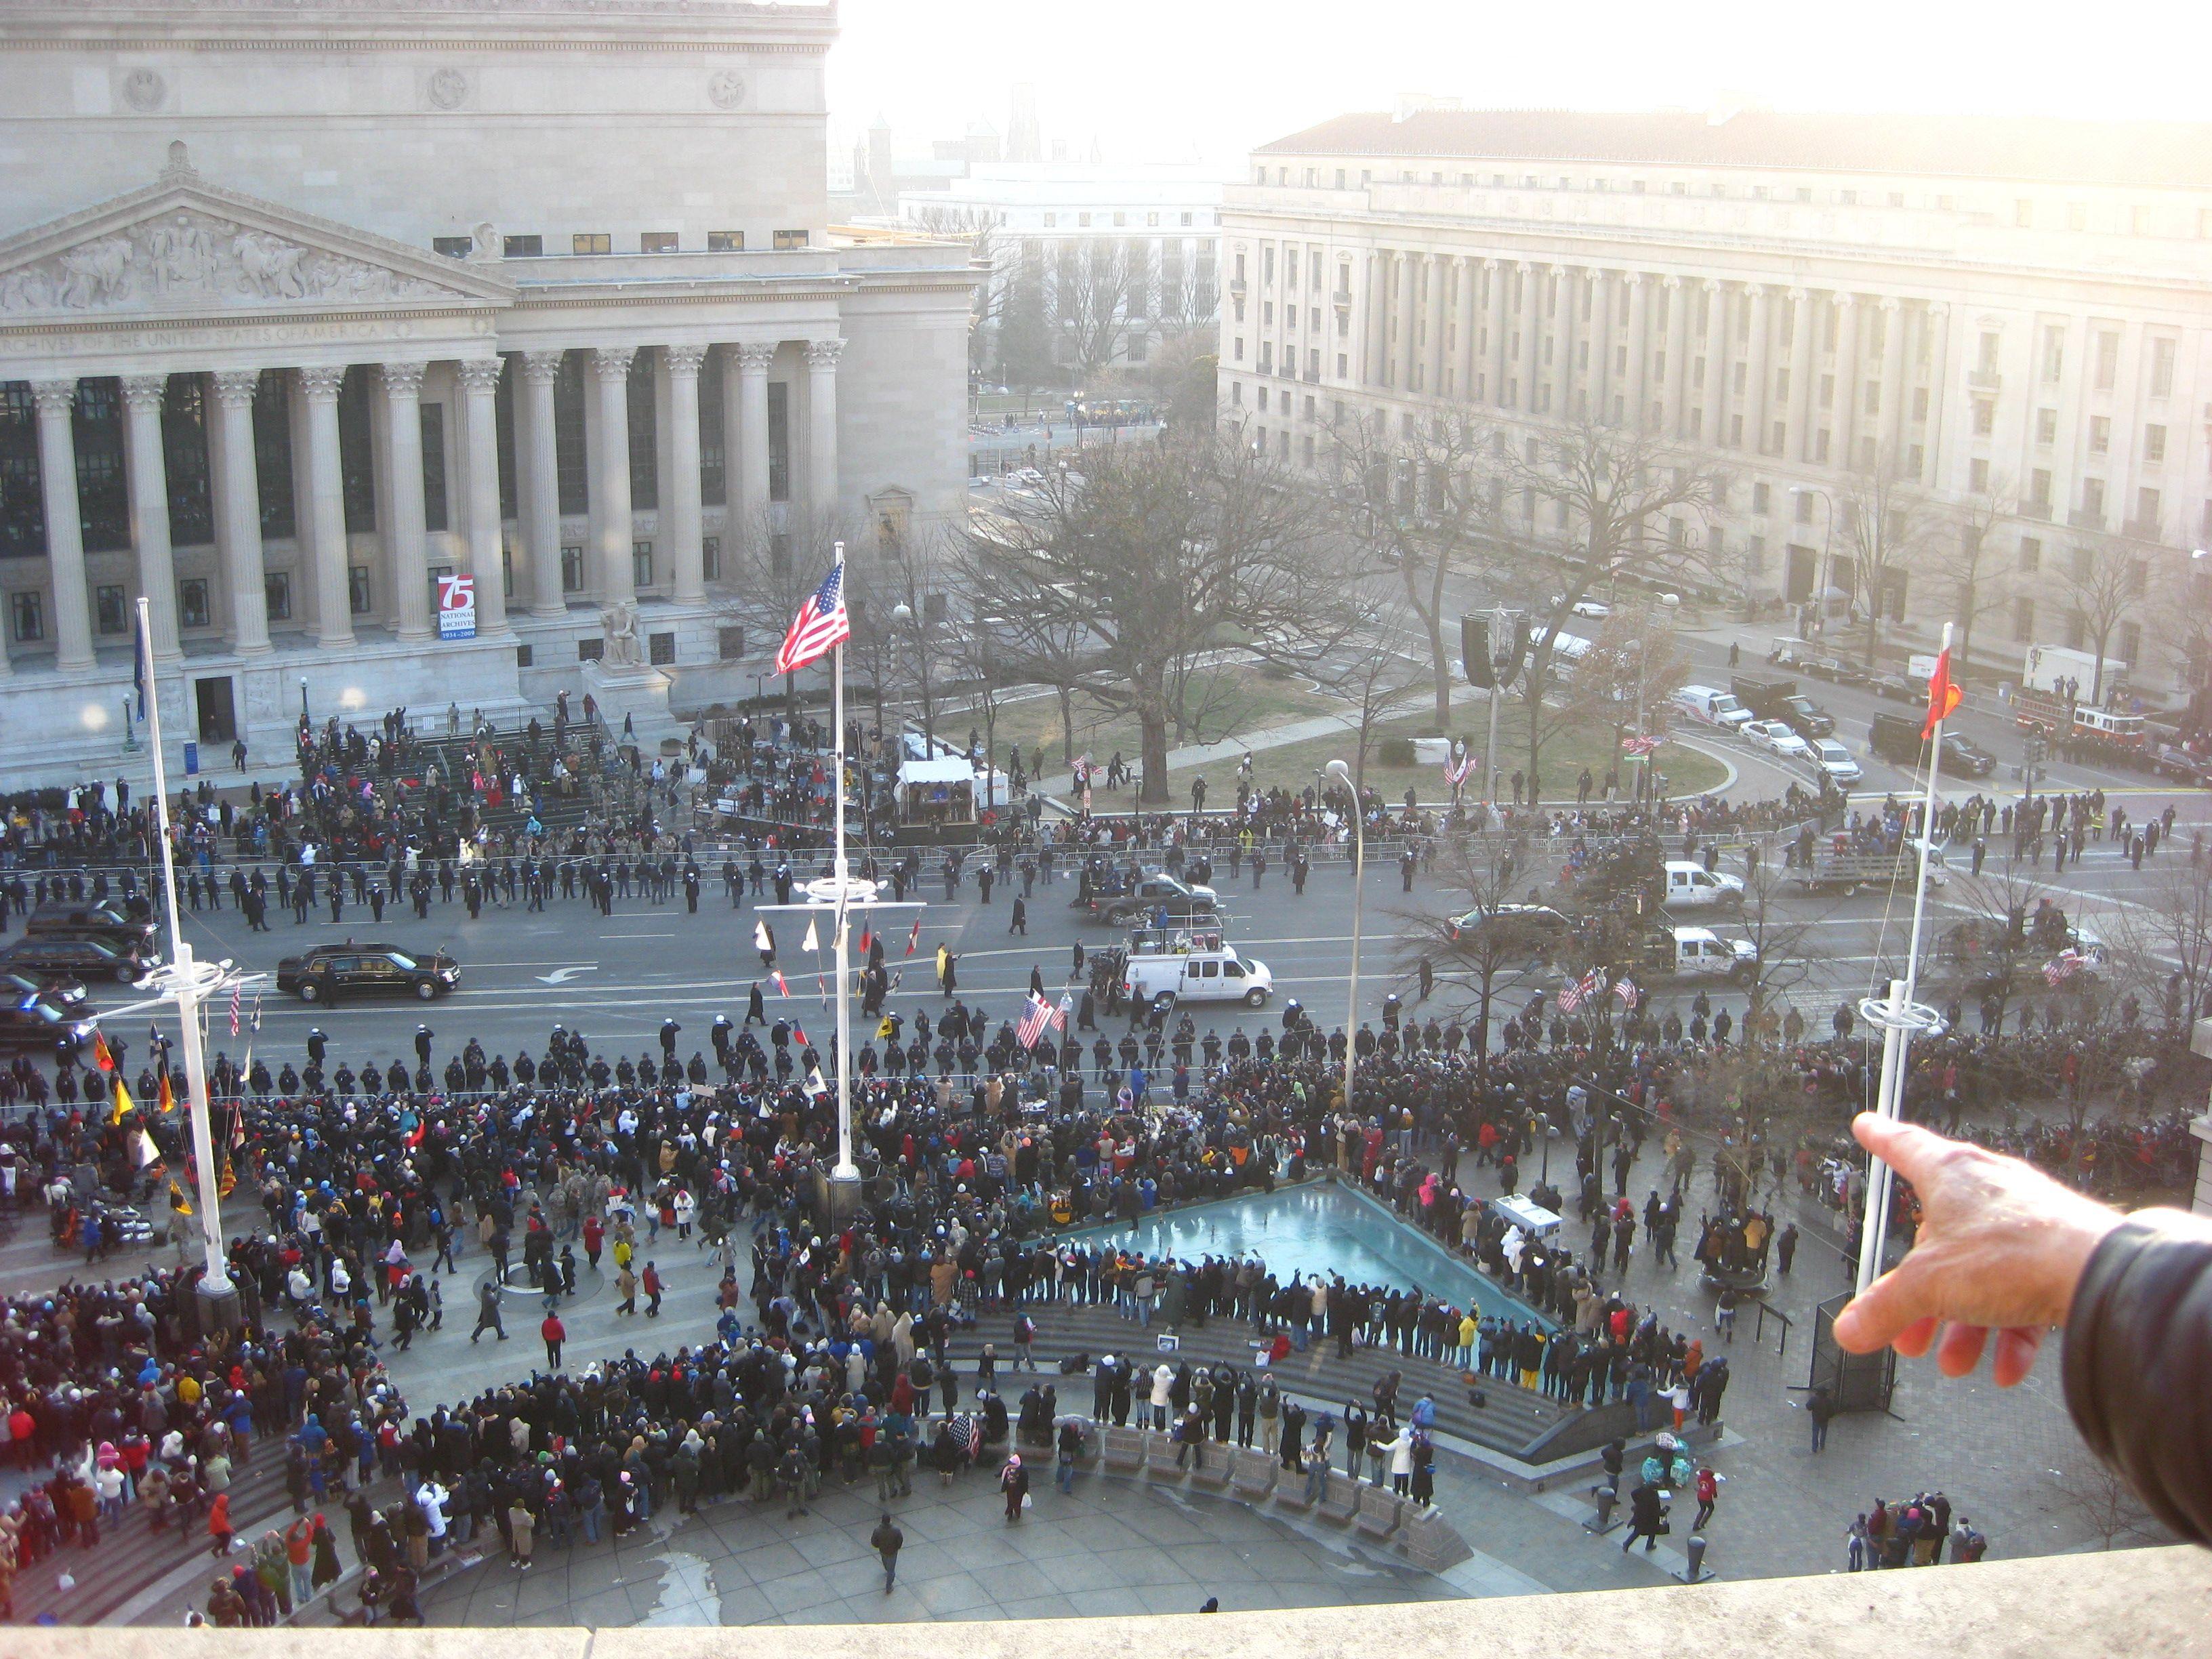 Obama Inaugural Photo